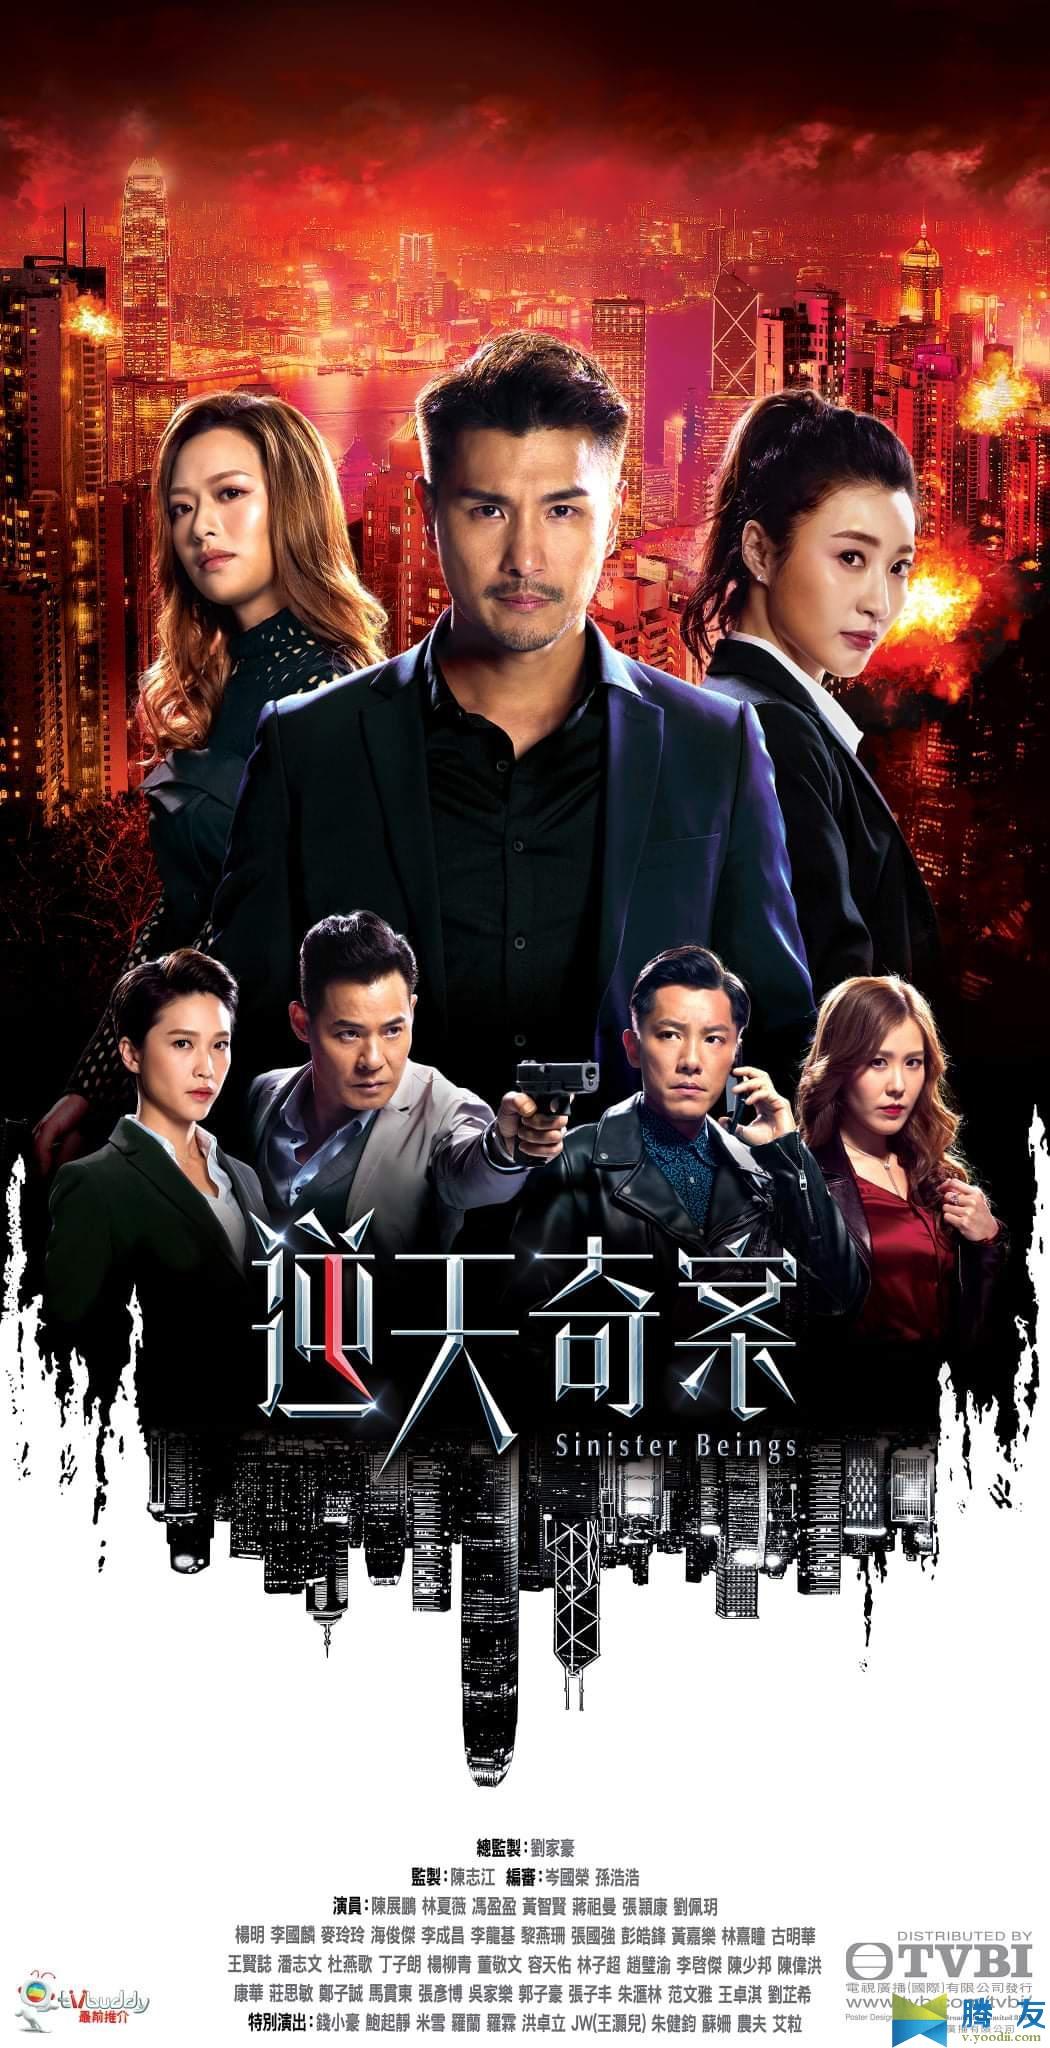 港剧 Sinister Beings 2021 逆天奇案 (30集全) 国粤双语 MKV